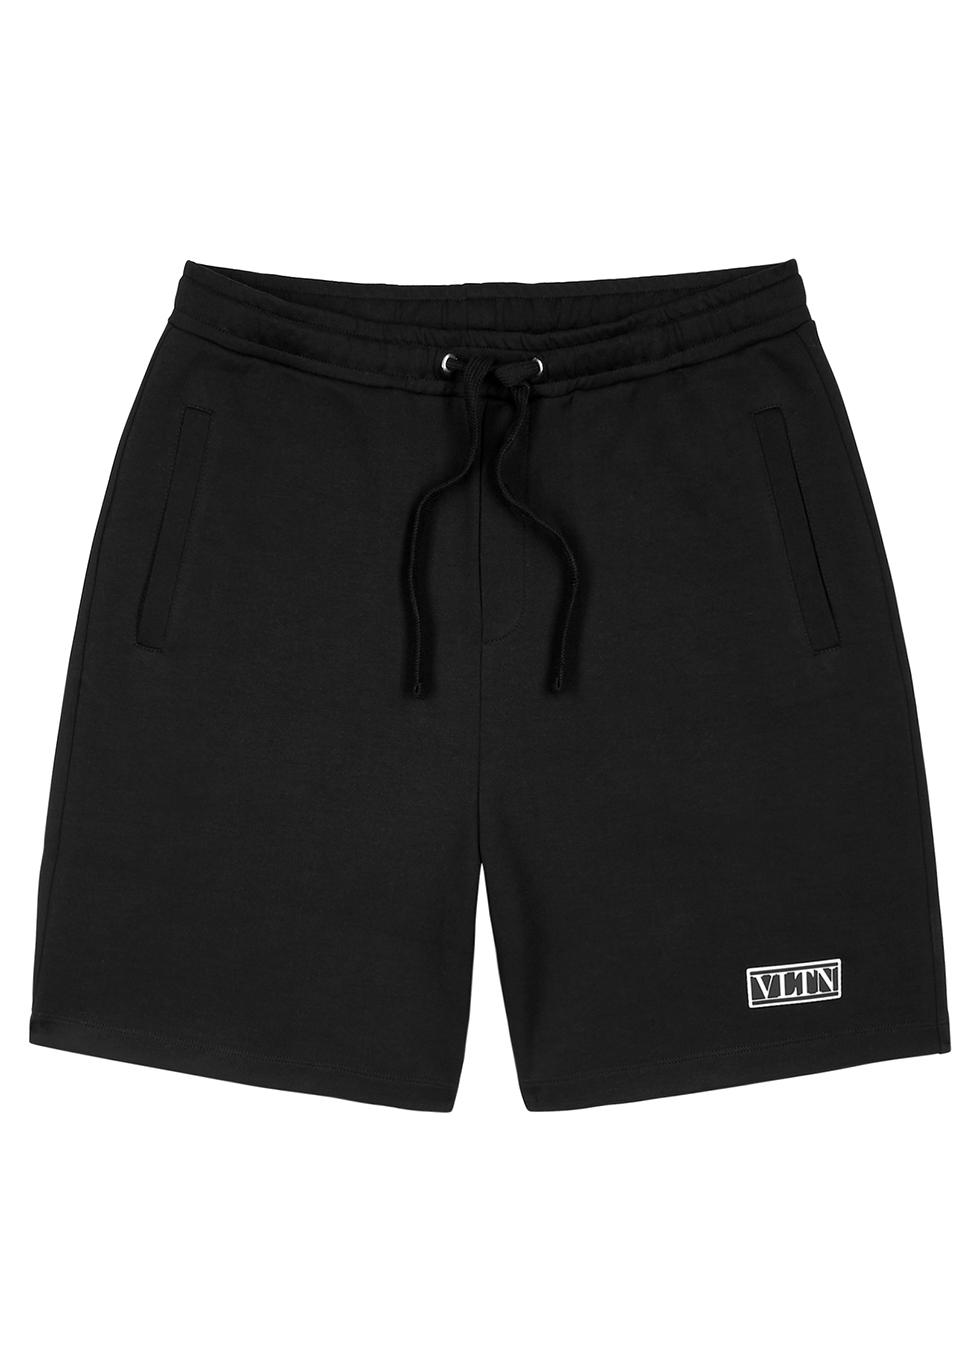 Valentino Vltn Black Cotton-blend Shorts